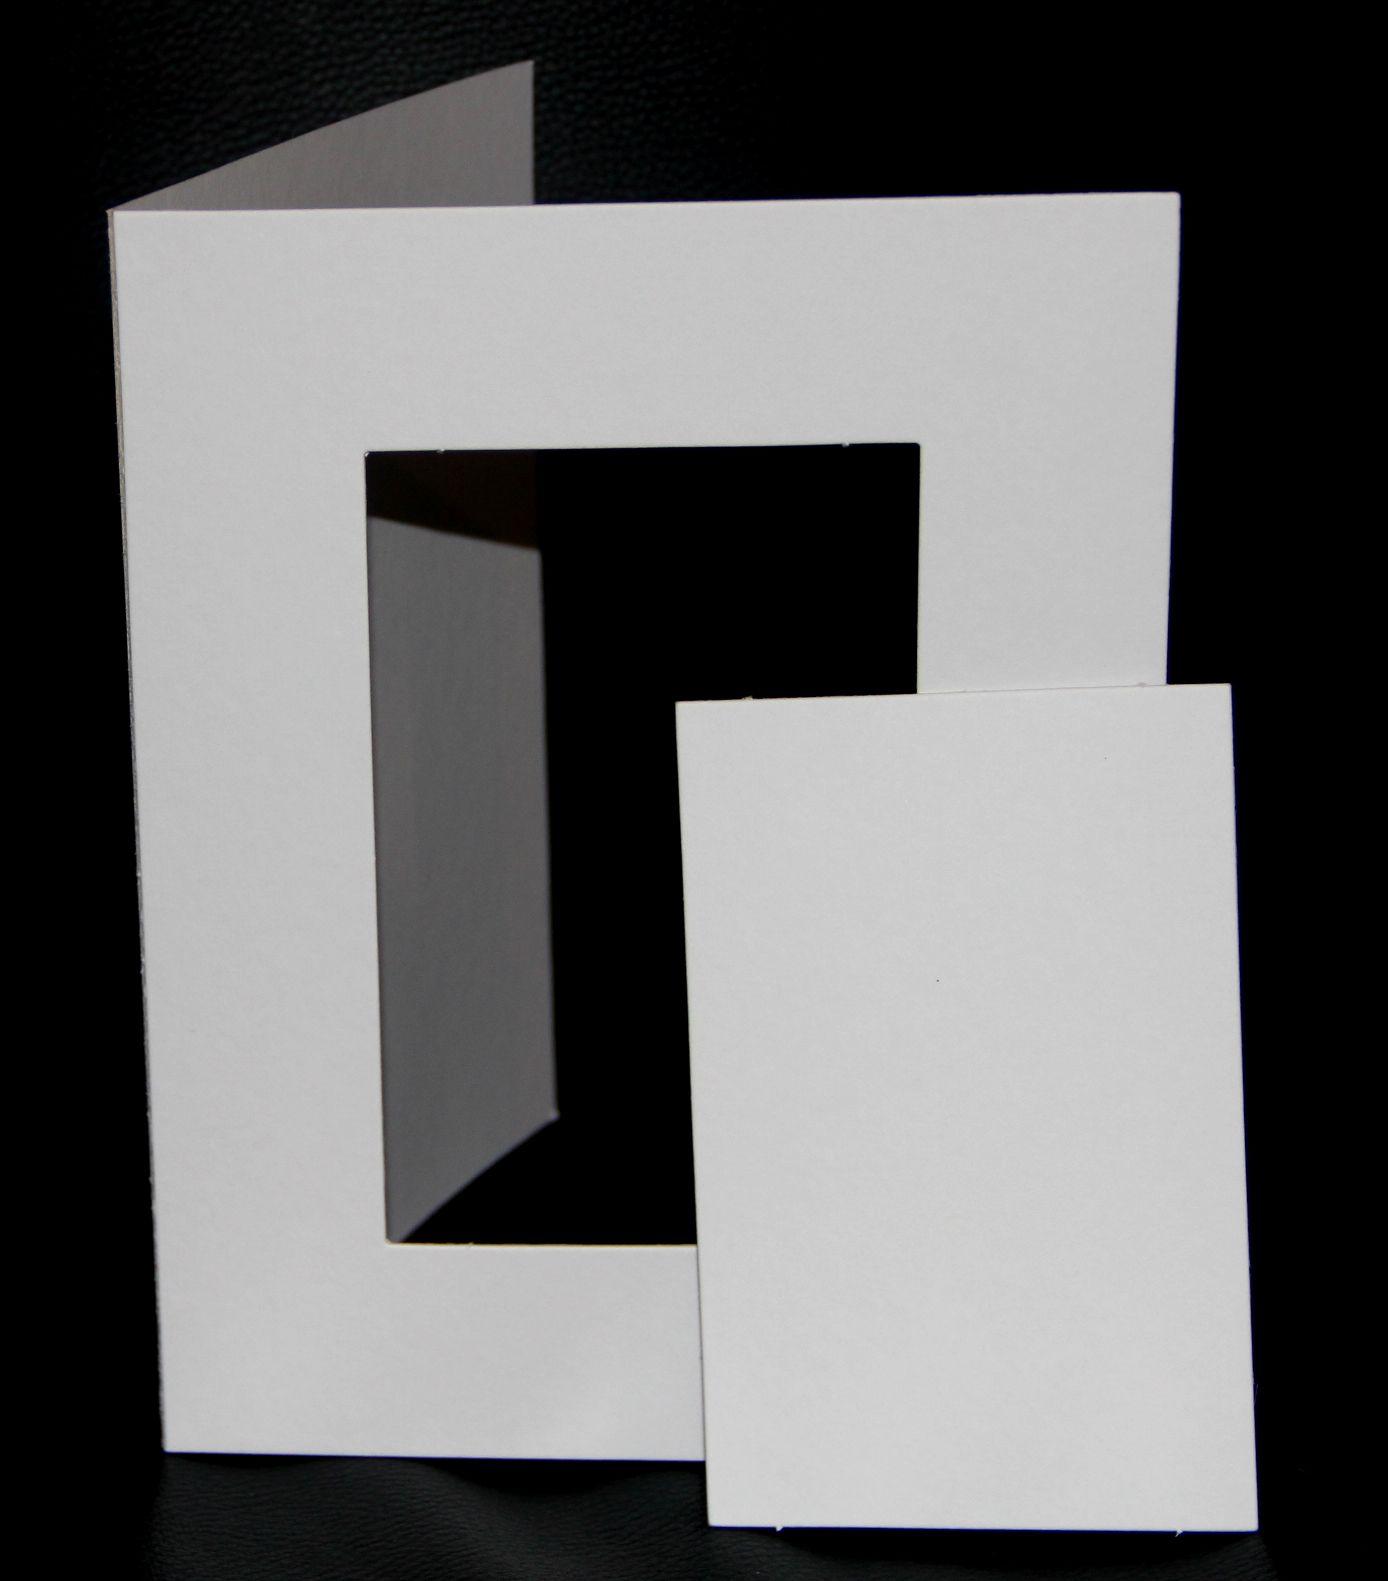 cadre photo decorer rectangle 17x22cm cadres d corer magommette. Black Bedroom Furniture Sets. Home Design Ideas